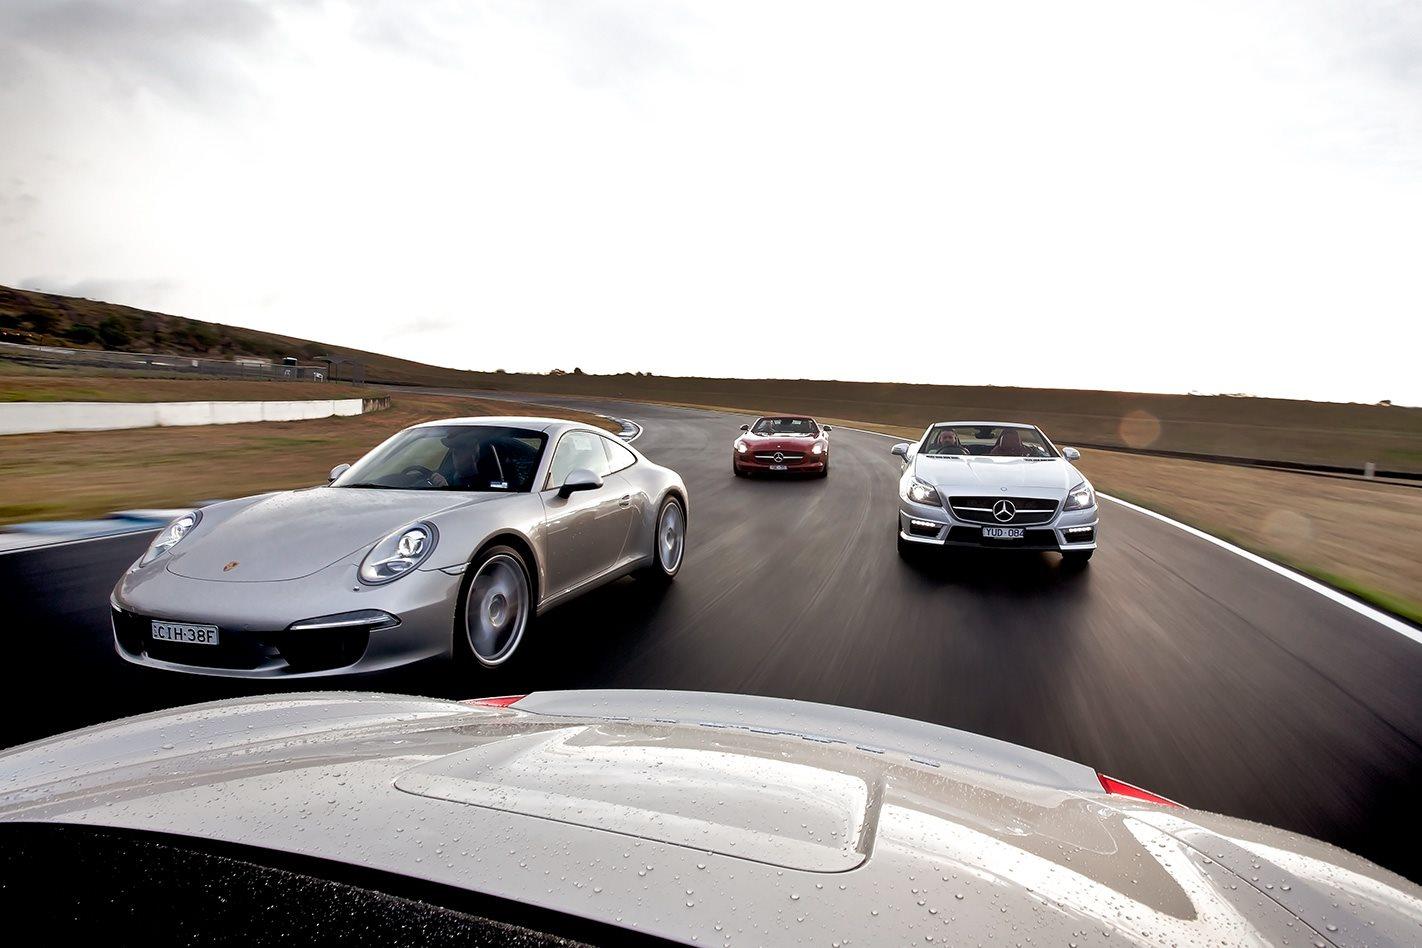 Mercedes-Benz-SLK-55-AMG-SLS-AMG-Porsche-Carrera.jpg